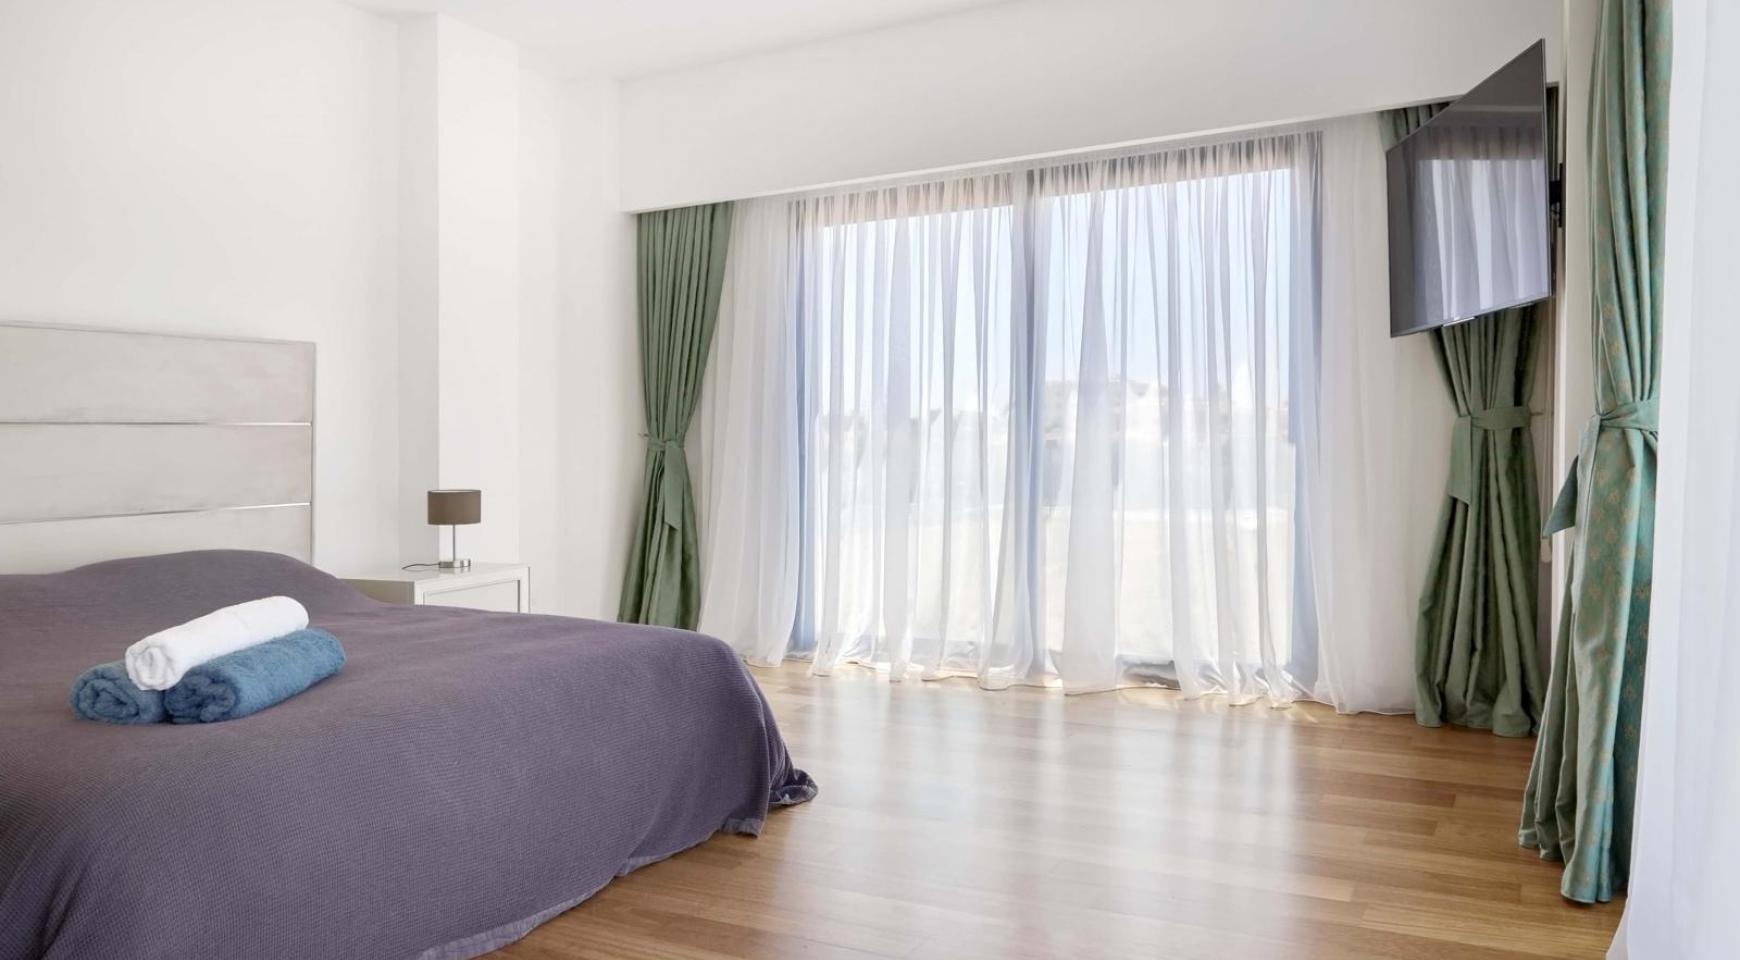 New Luxurious 4 Bedroom Villa in the Tourist Area - 28